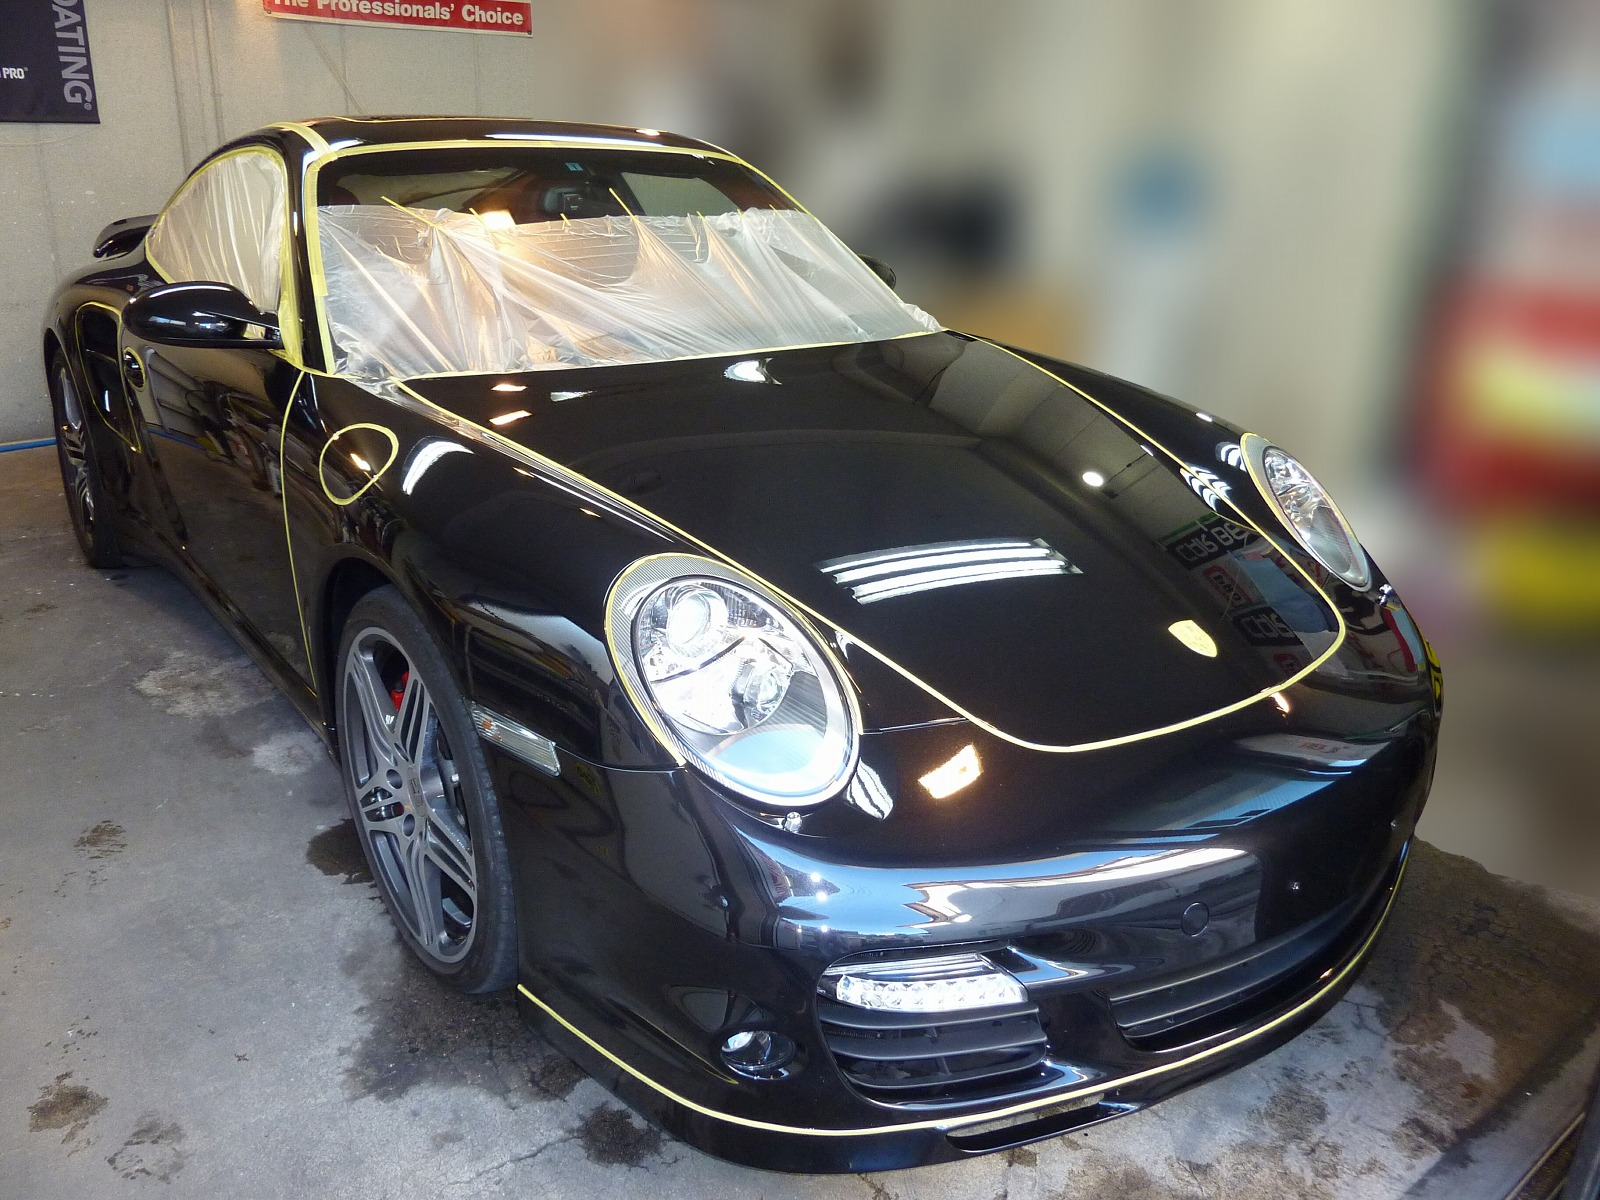 20140310-porsche-911-turbo-02